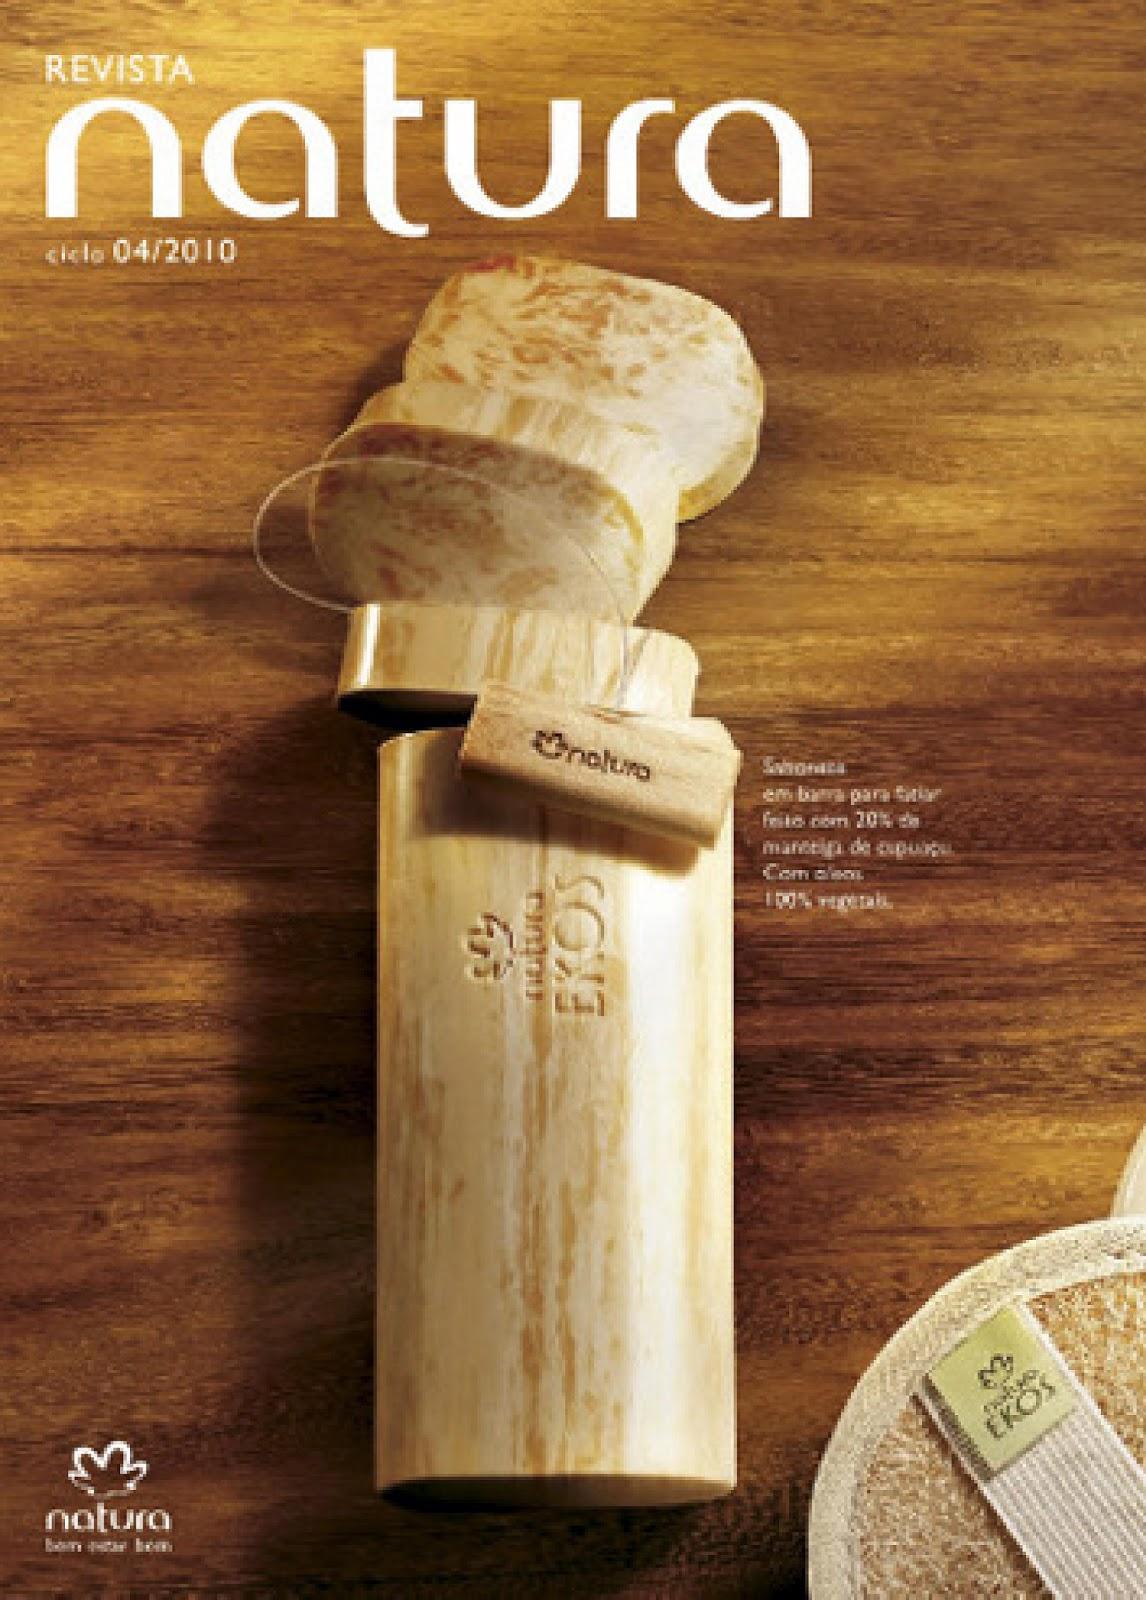 Revista Natura Ciclo 04/2010